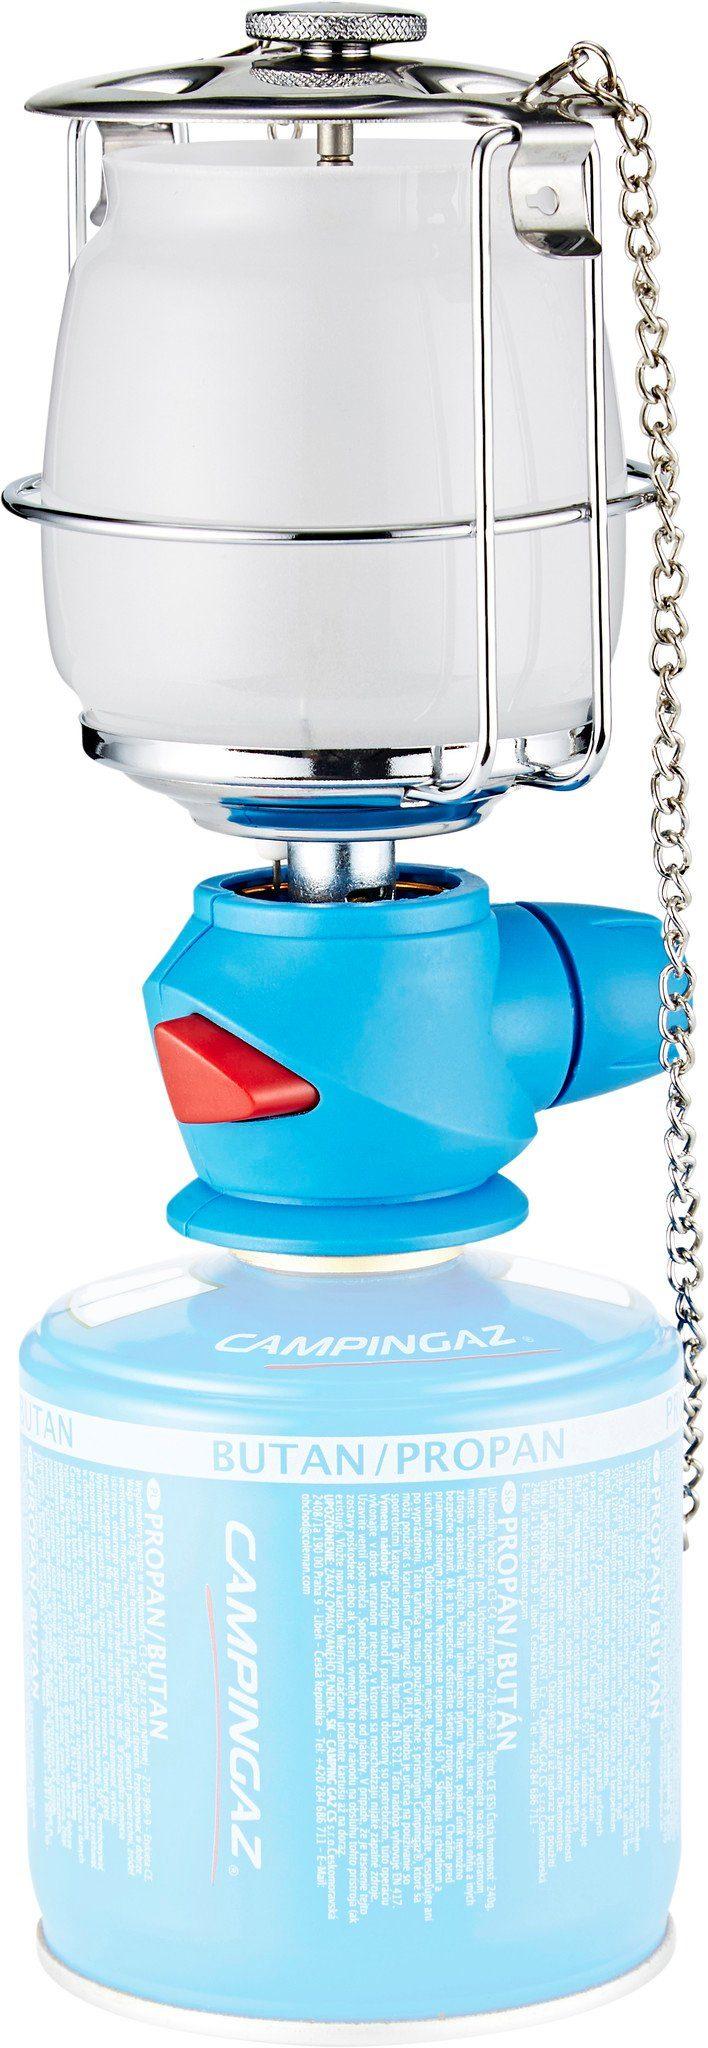 Campingaz Camping-Beleuchtung »Lumostar Plus PZ Lantern«